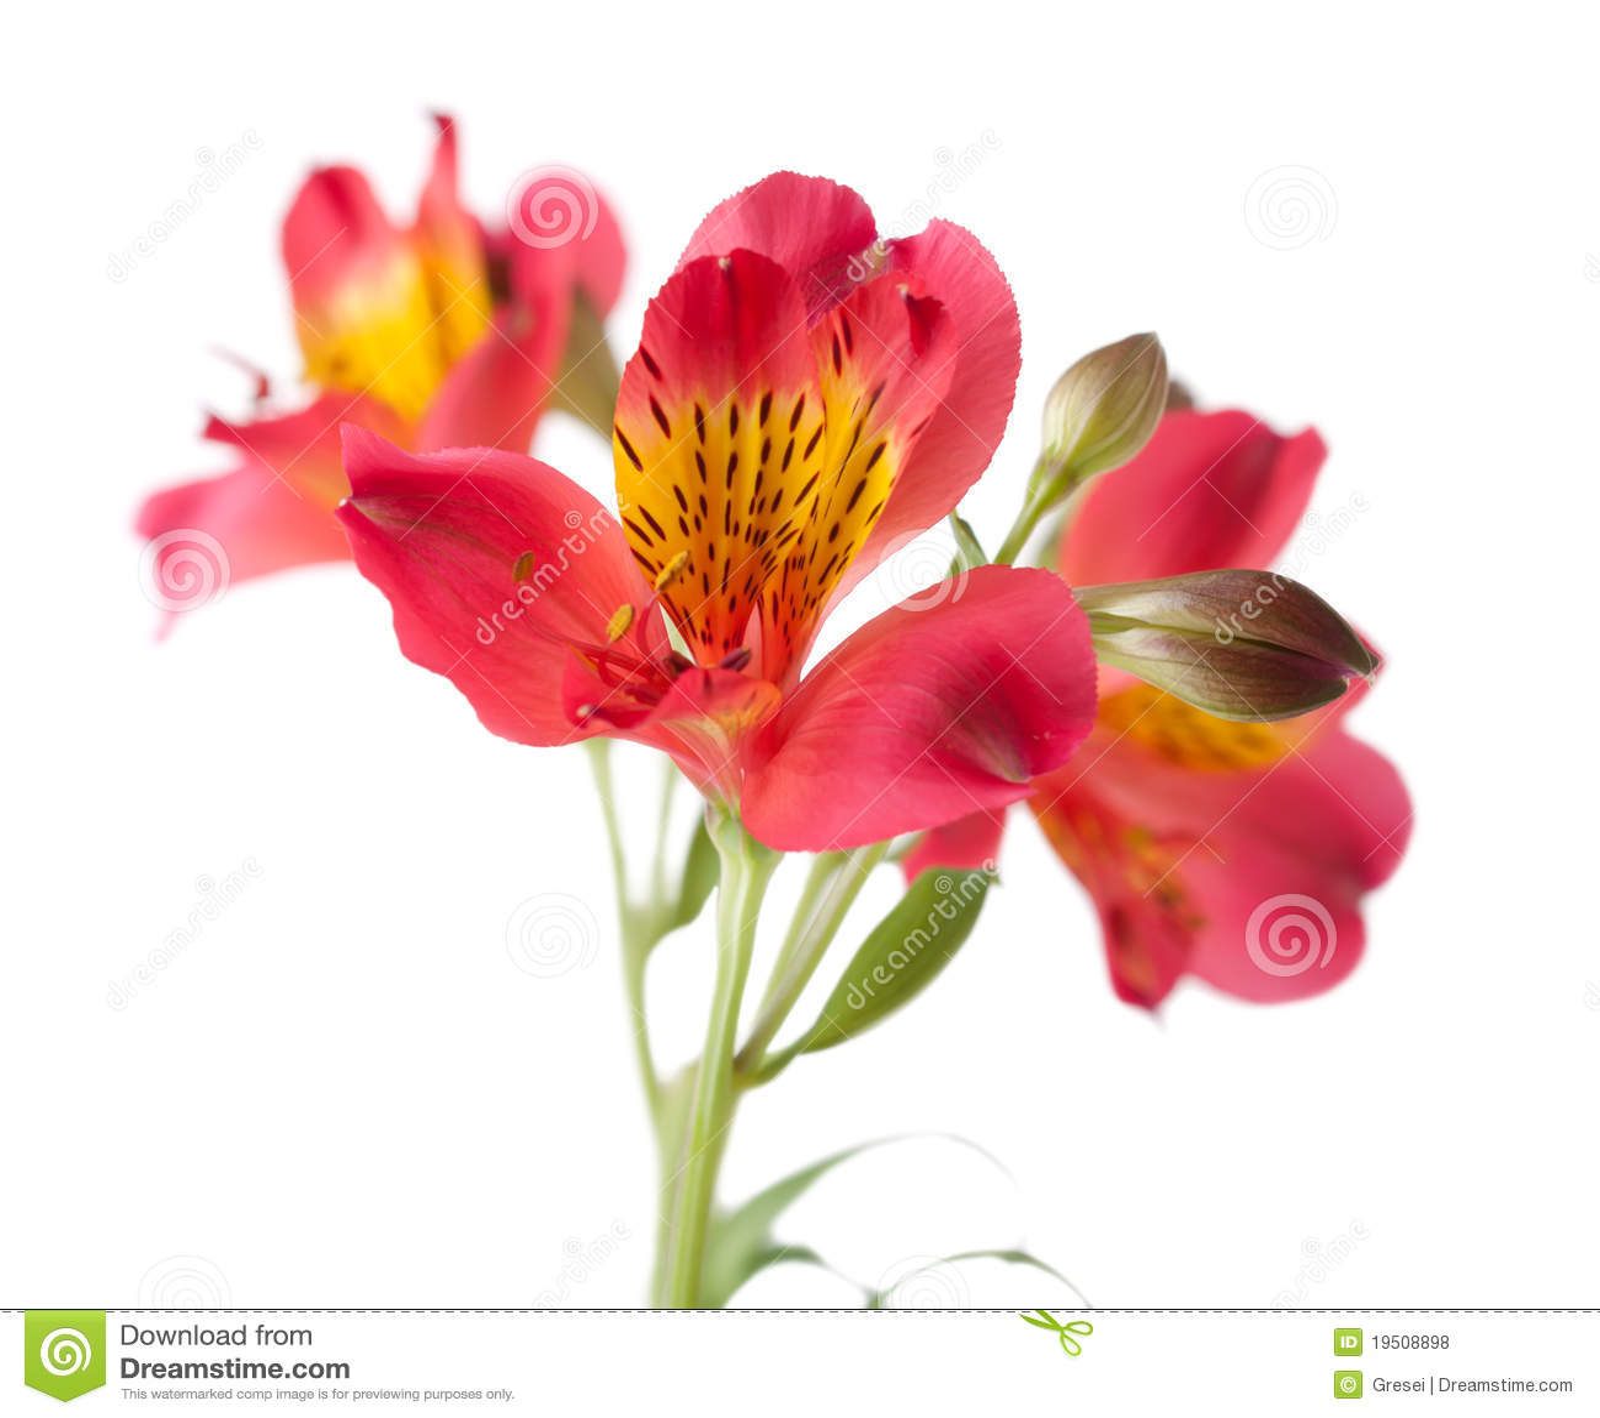 alstroemeria flowers  flower, Natural flower